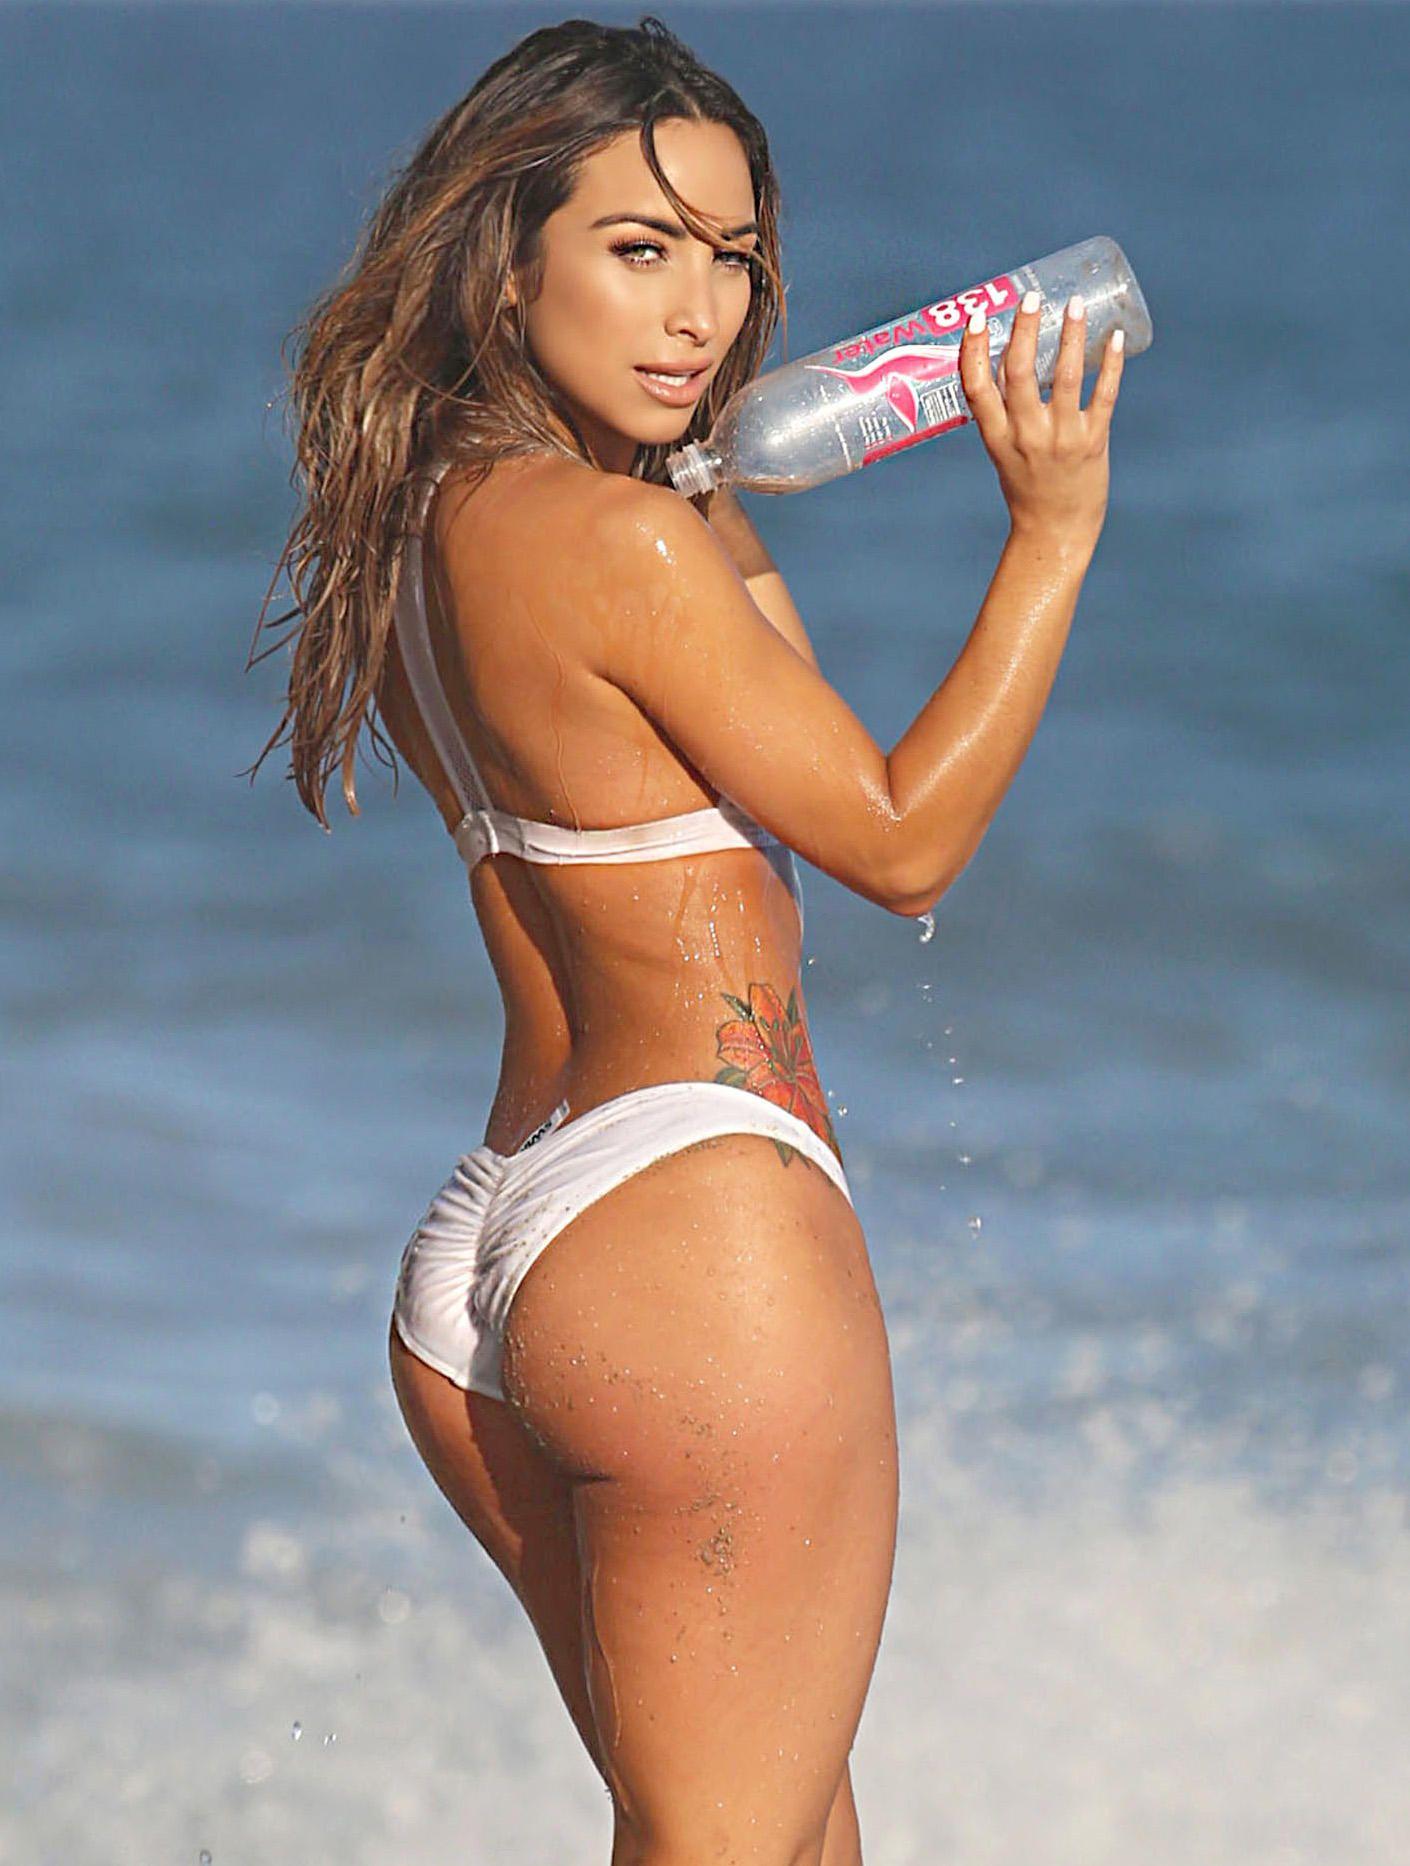 Yesenia-Bustillo-Bikini-8